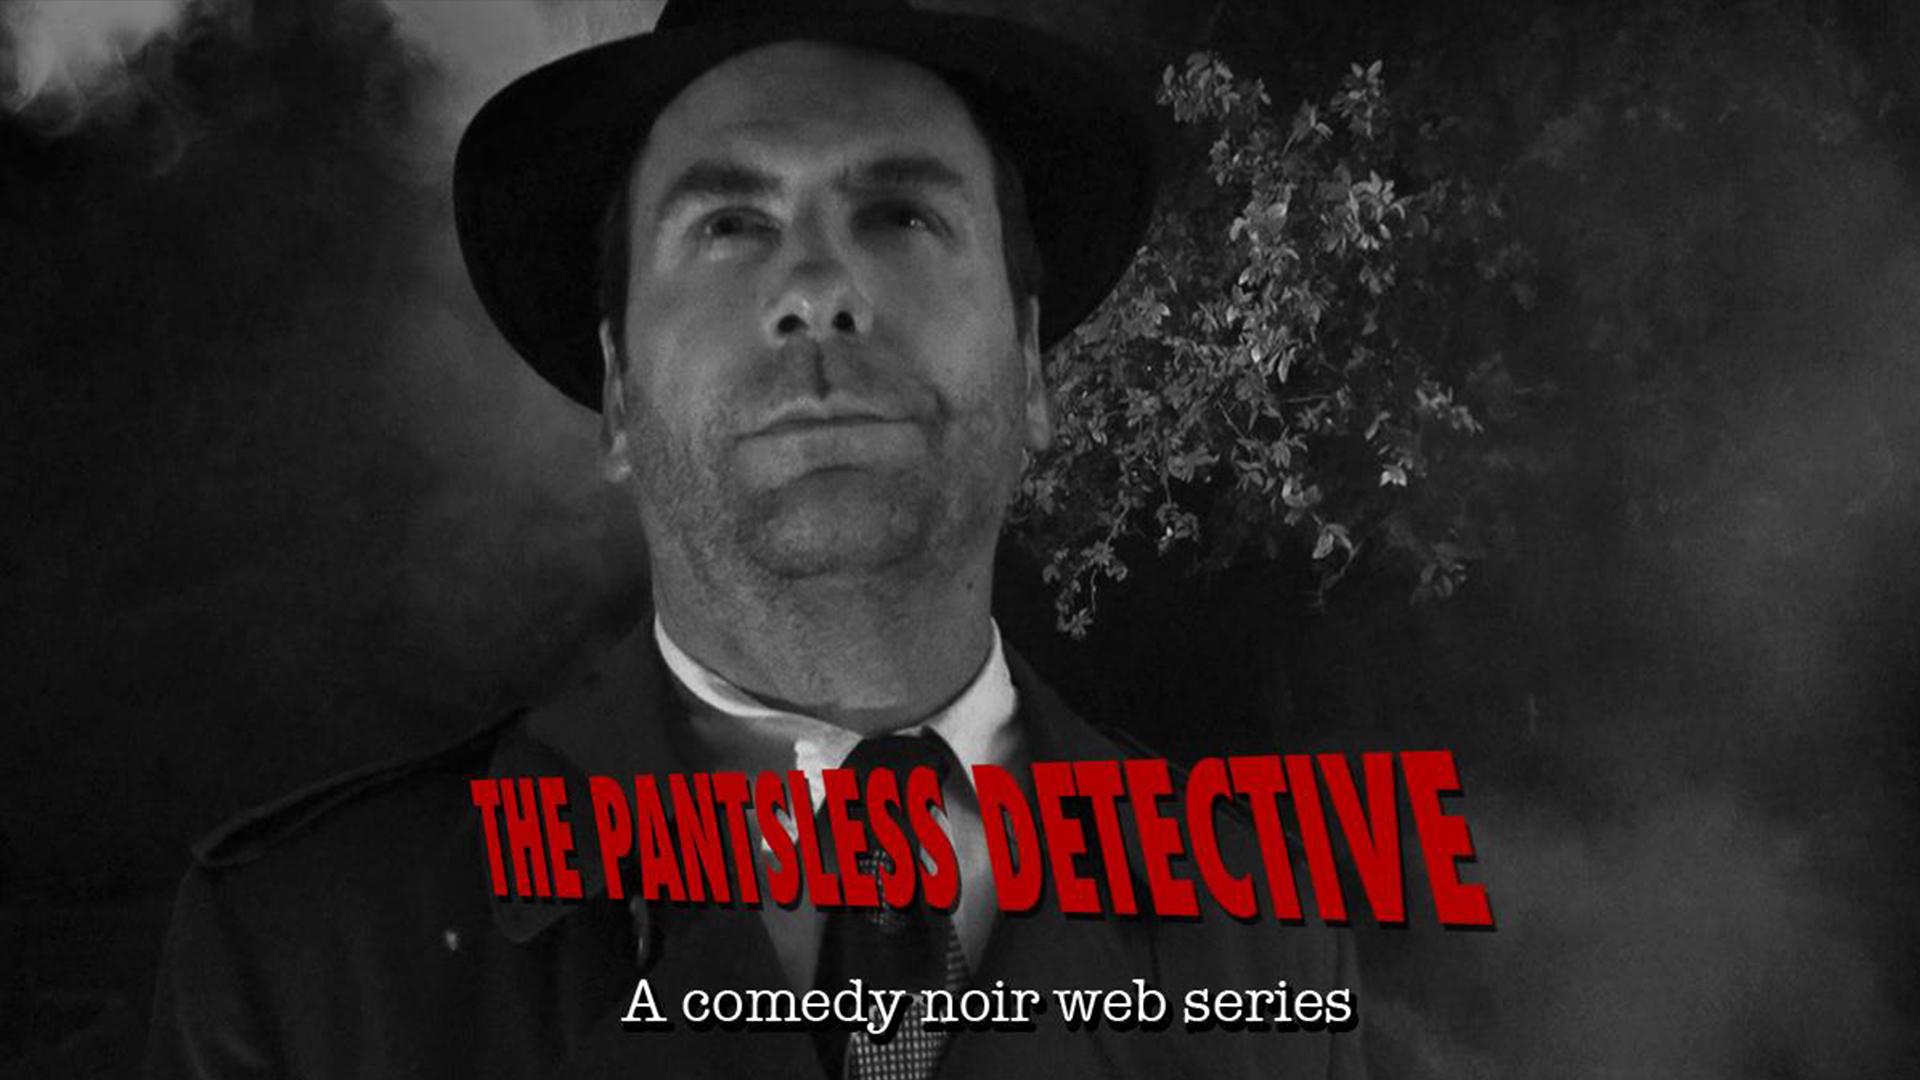 The Pantsless Detective